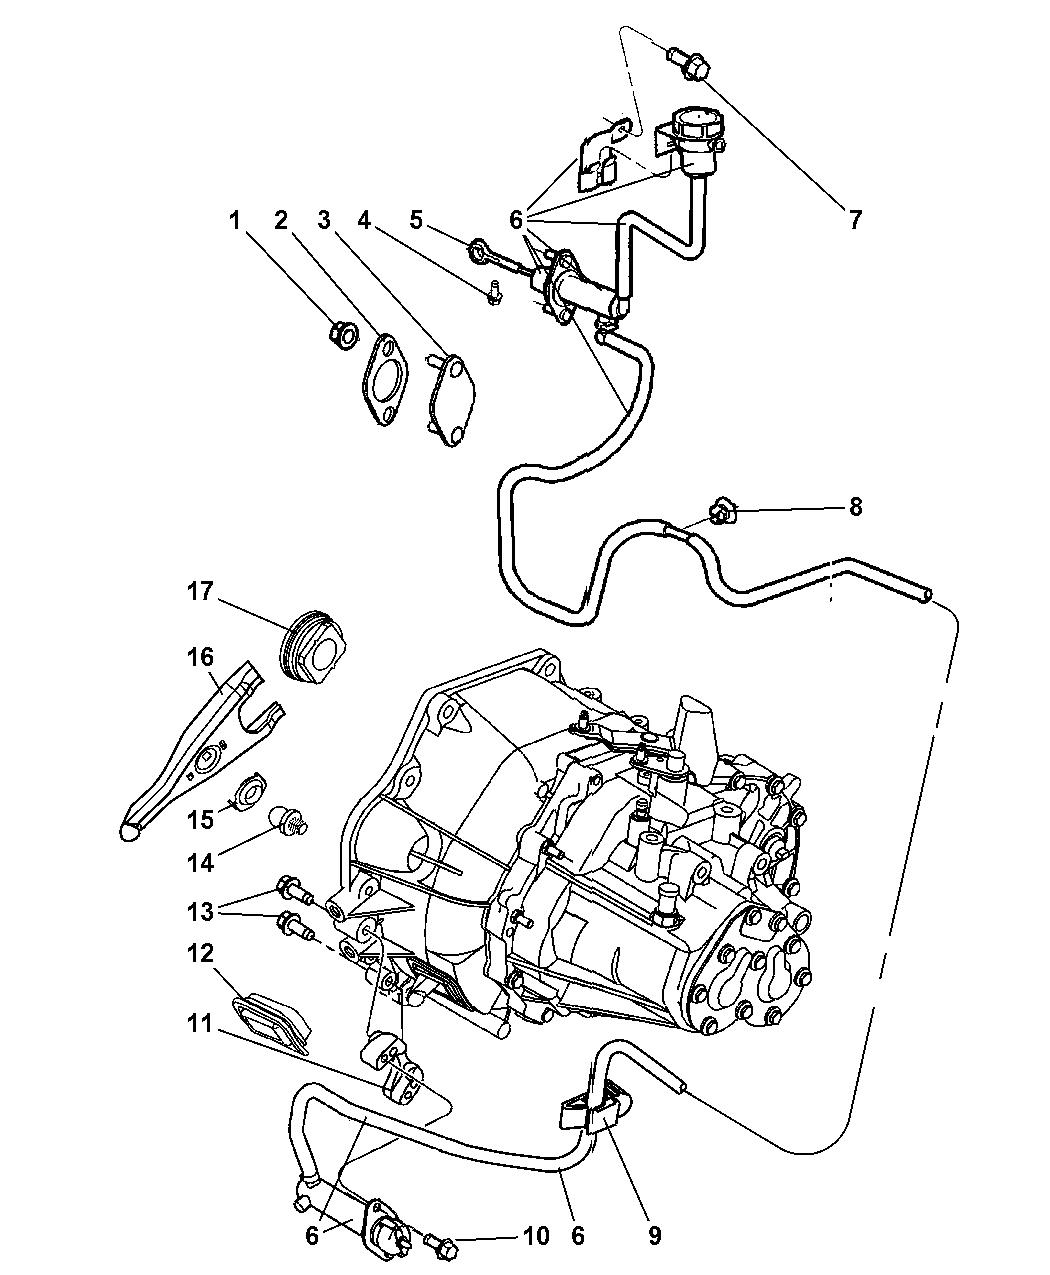 2008 Chrysler Pt Cruiser Controls Hydraulic Clutch Engine Diagram Thumbnail 1